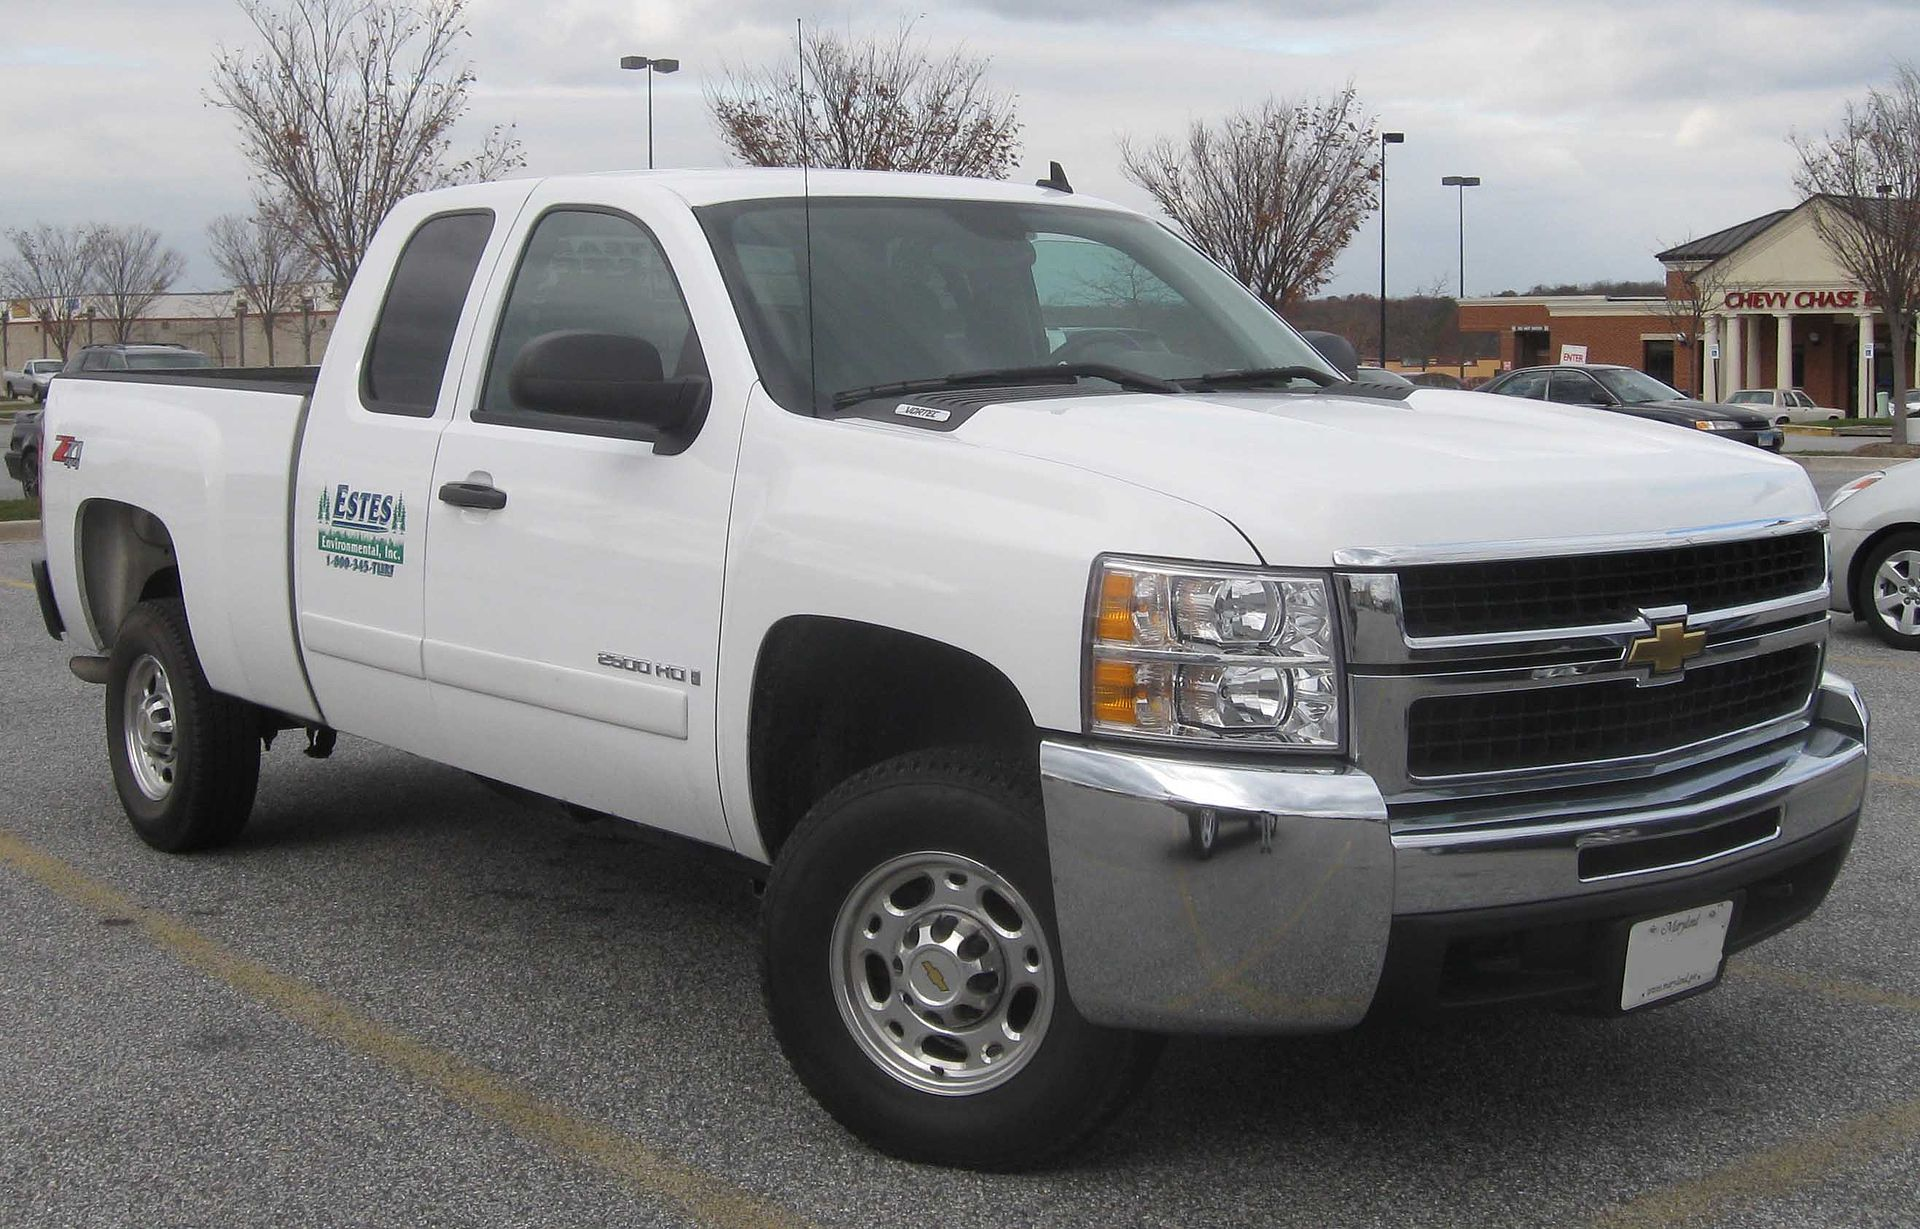 2007 Chevy Silverado Dually Duramax Diesel Offered For Auto Wiring Diagram